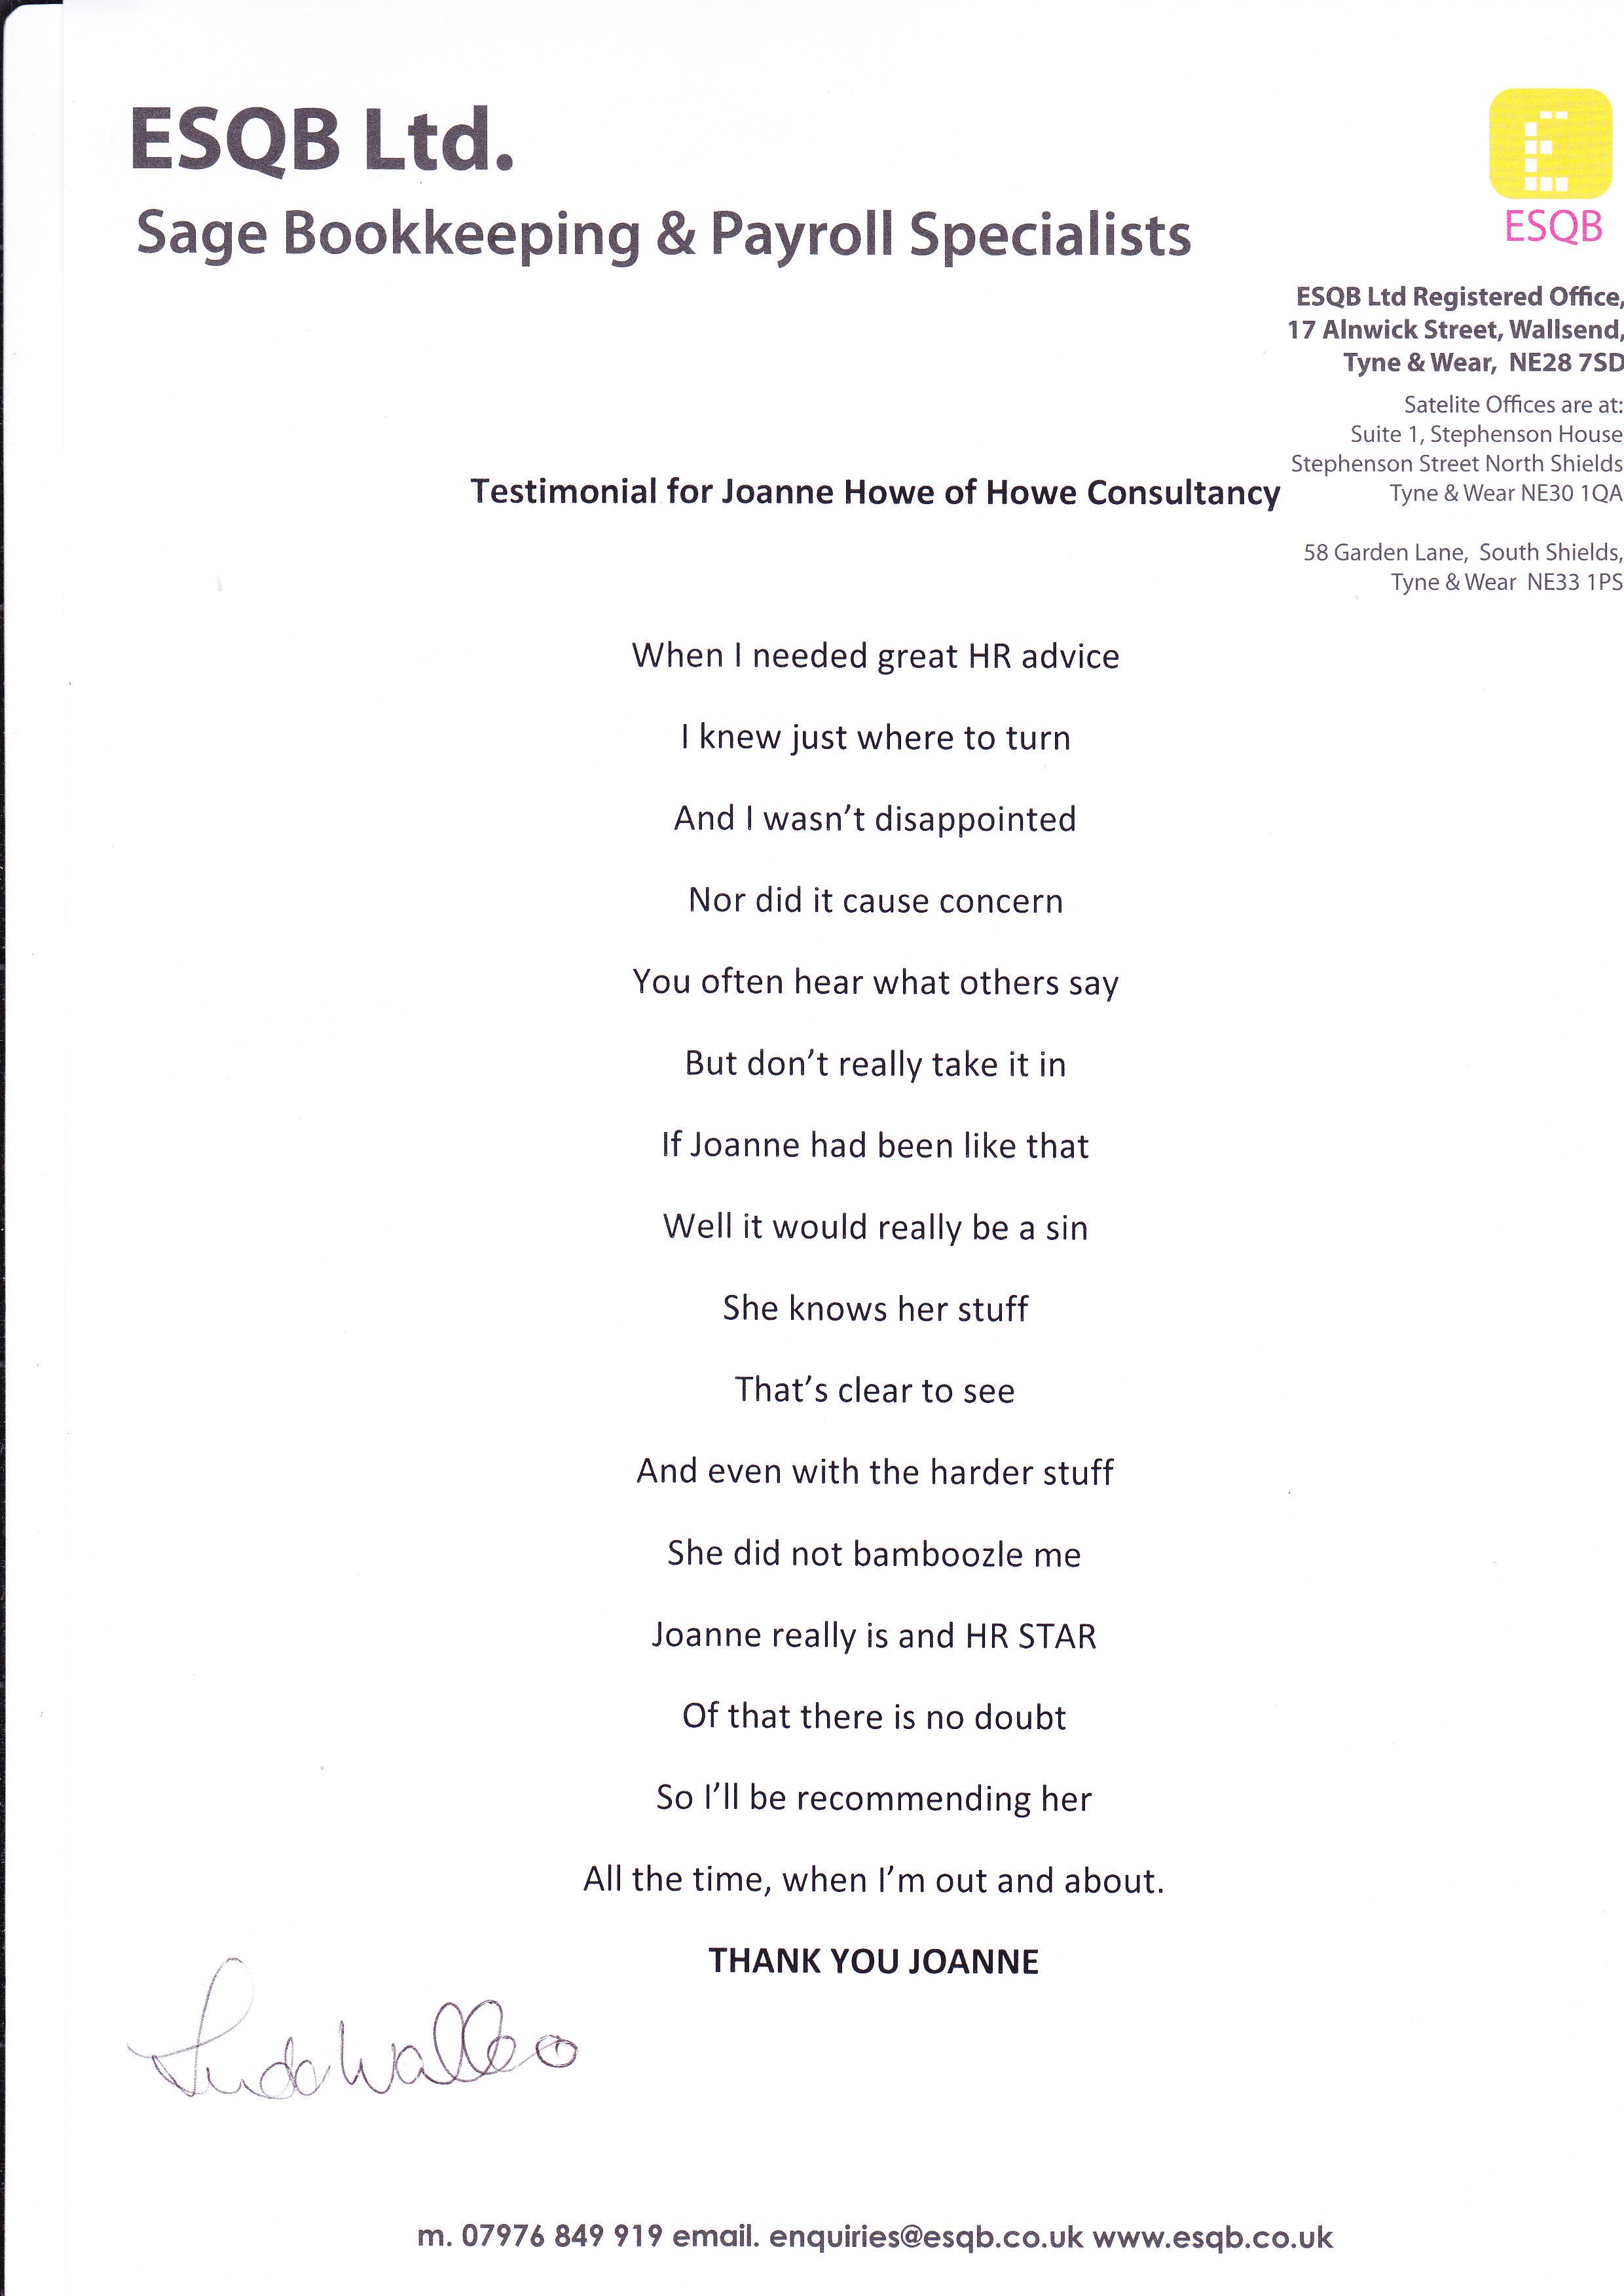 ESQB HR Support Testimonial